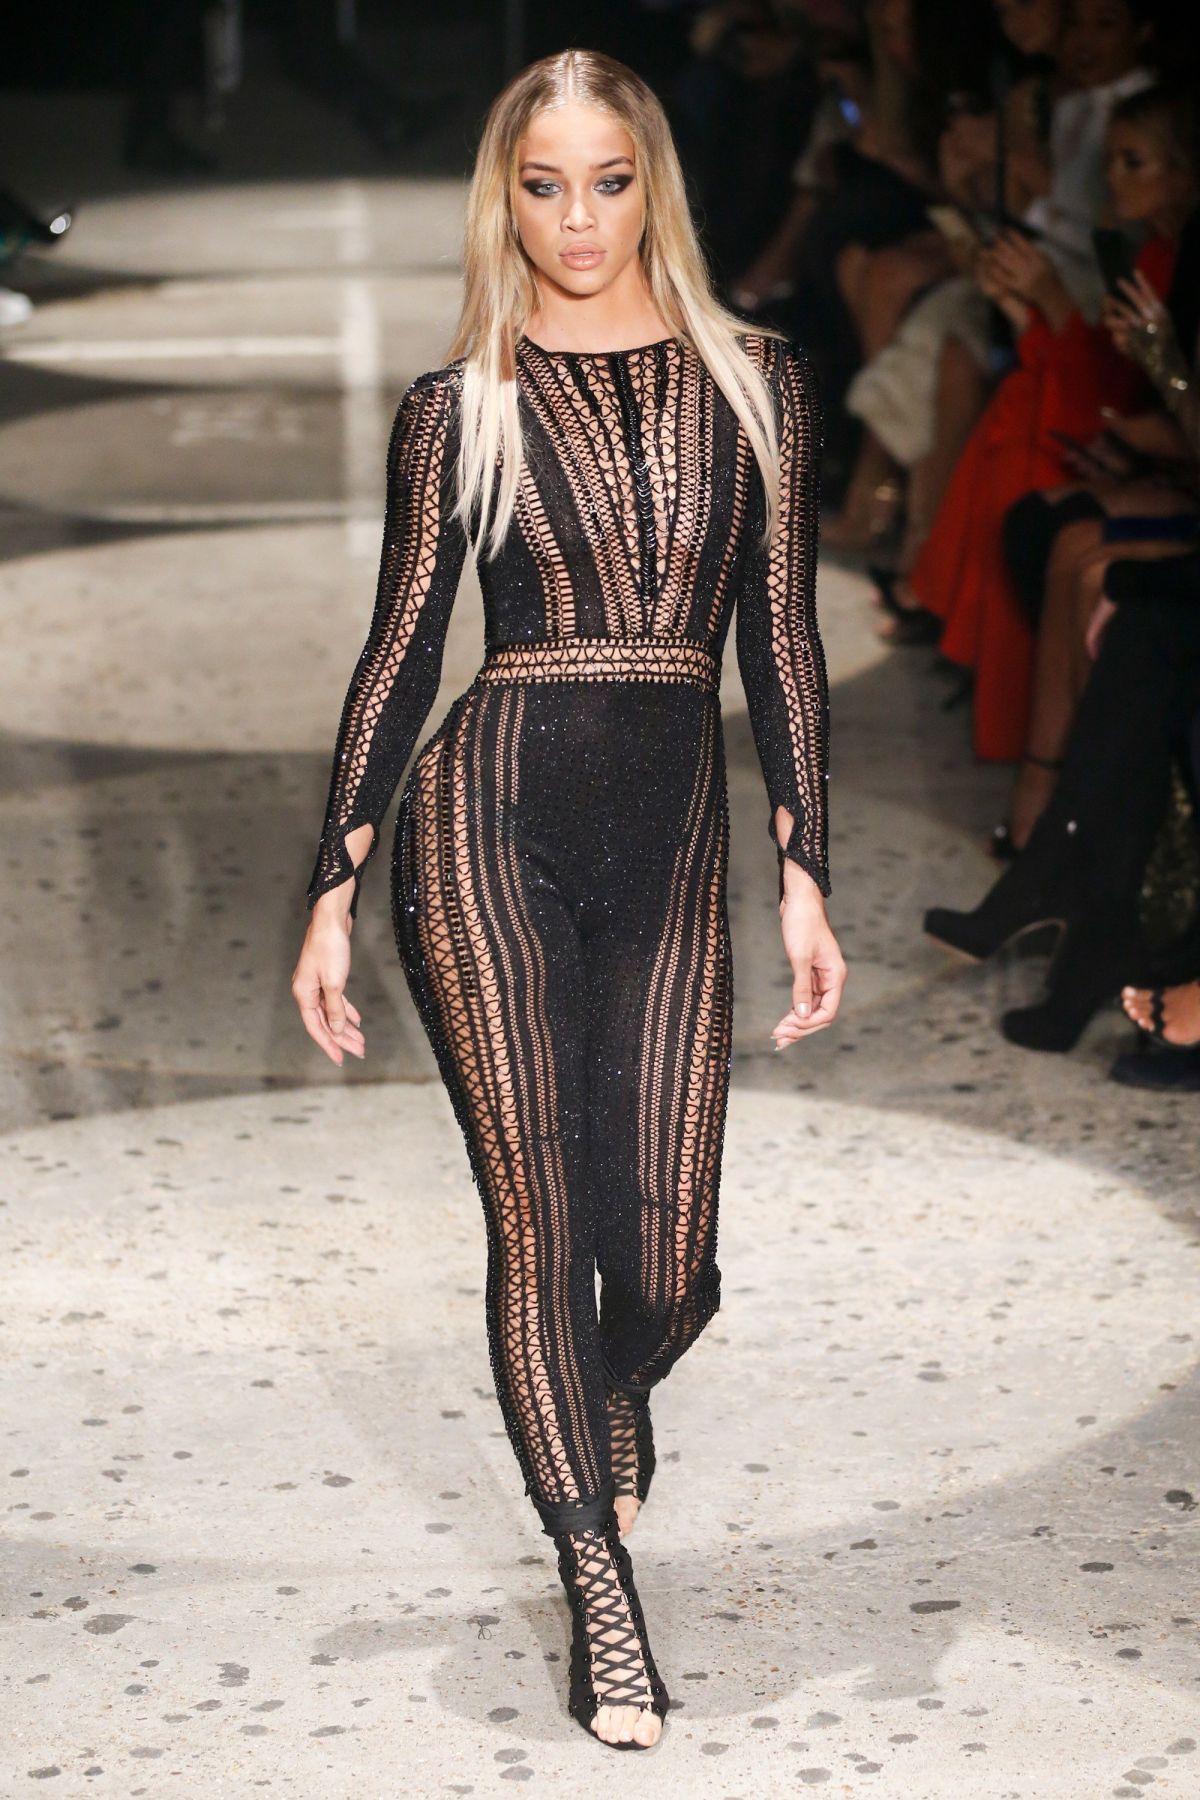 JASMINE SANDERS at Julien MaCdonald Fashion Show at London Fashion Week 09/18/2017